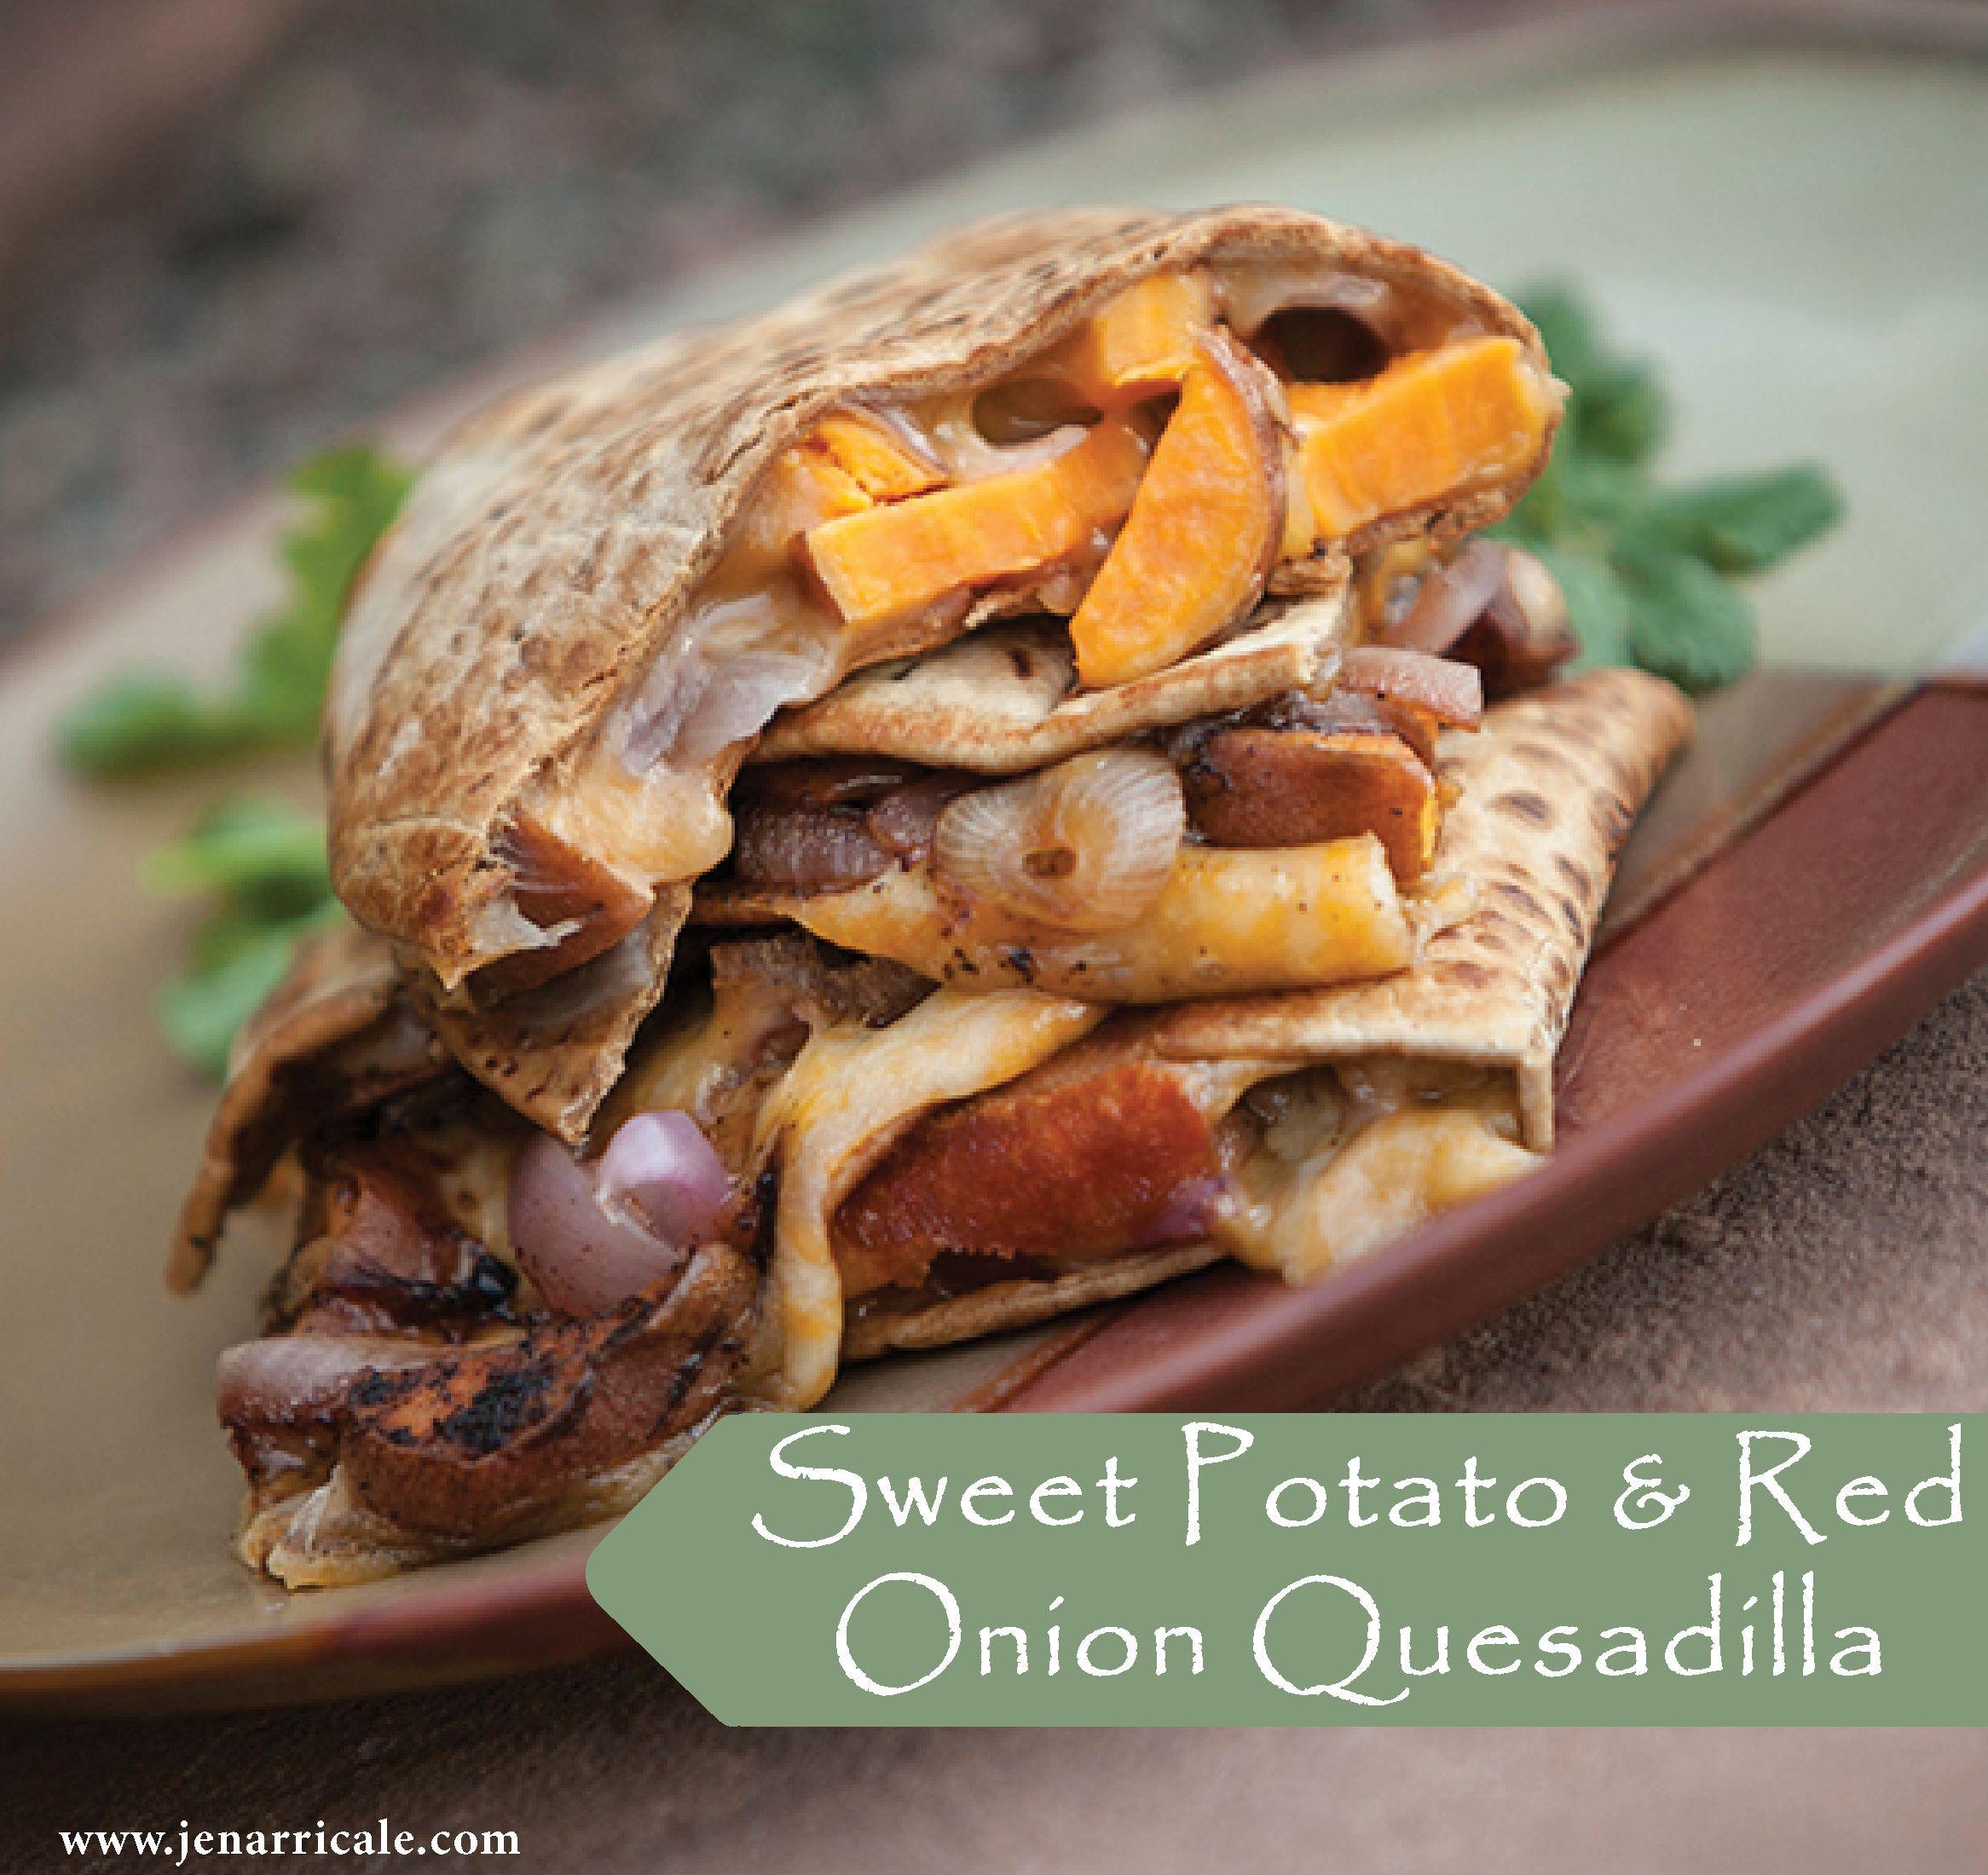 Sweet Potato and Red Onion Quesadilla http://www.jenarricale.com/recipes/sweet-potato-and-red-onion-quesadilla-serves-4-6/